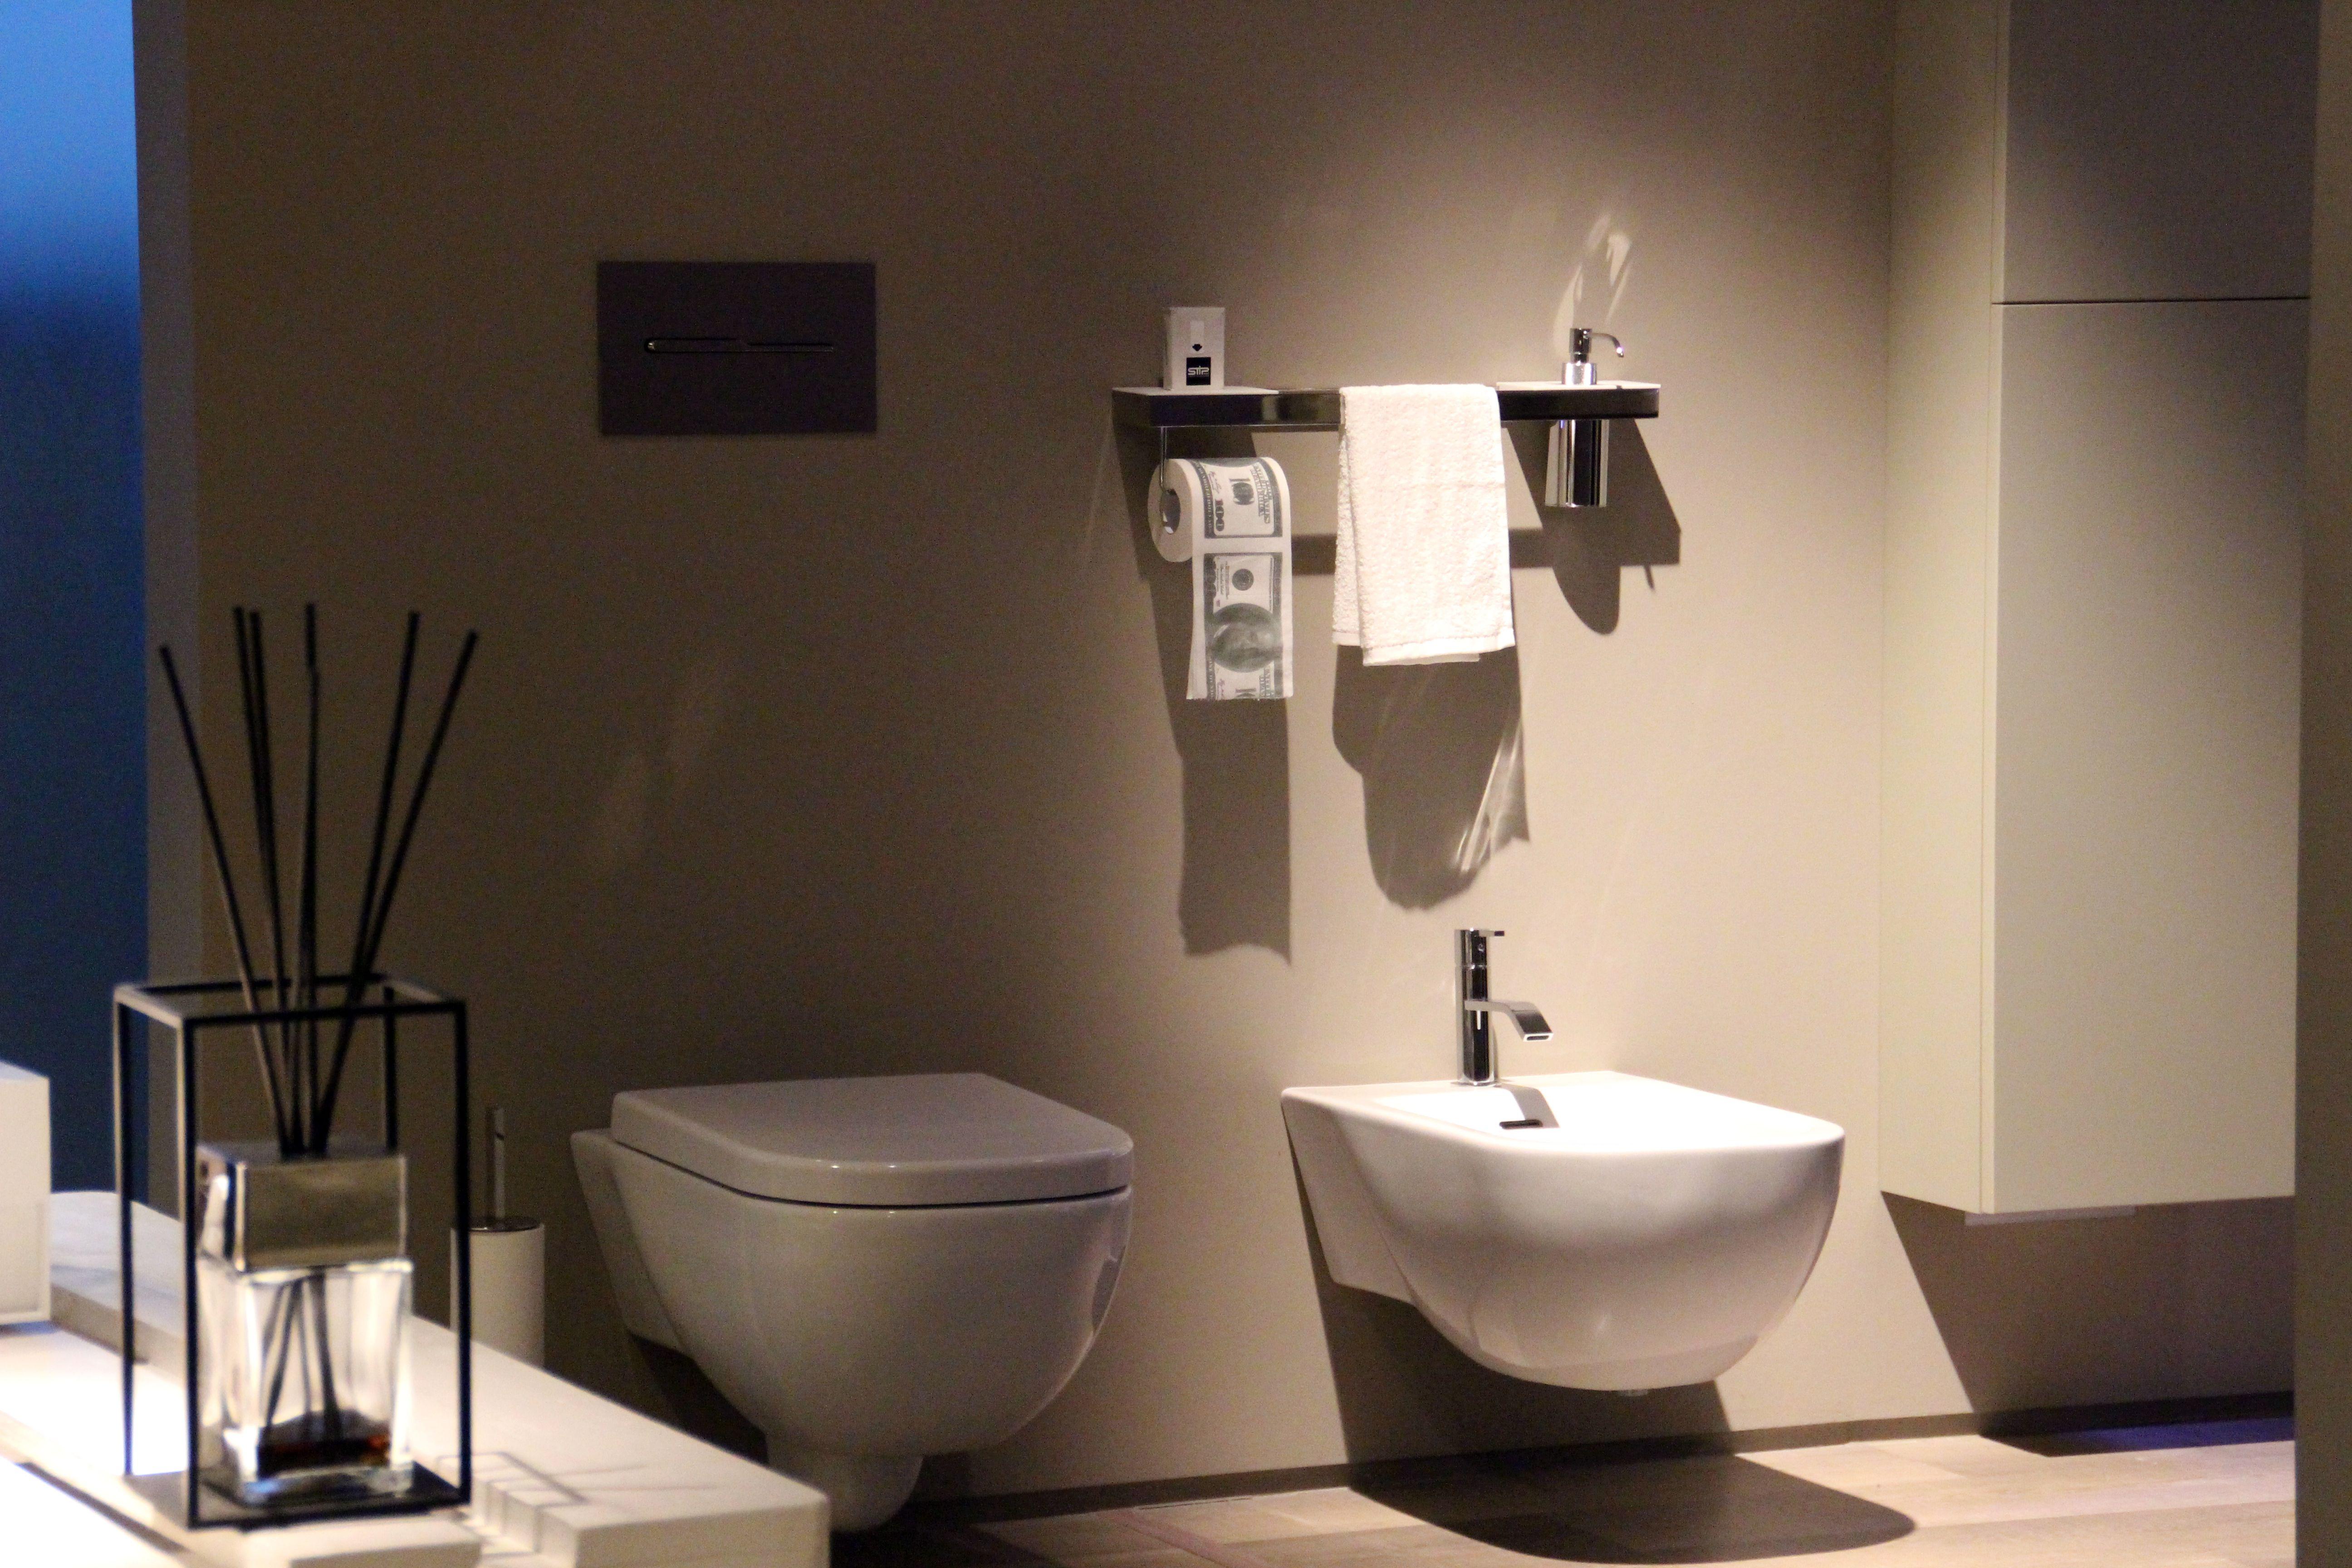 Showroom 1 #stipbagni #roevolciano #trento #salò #spa #wellness #showroom #bathroom #design #relax #nature #detail #interiordesign #italiandesign #ratail #collection #project #inspiration